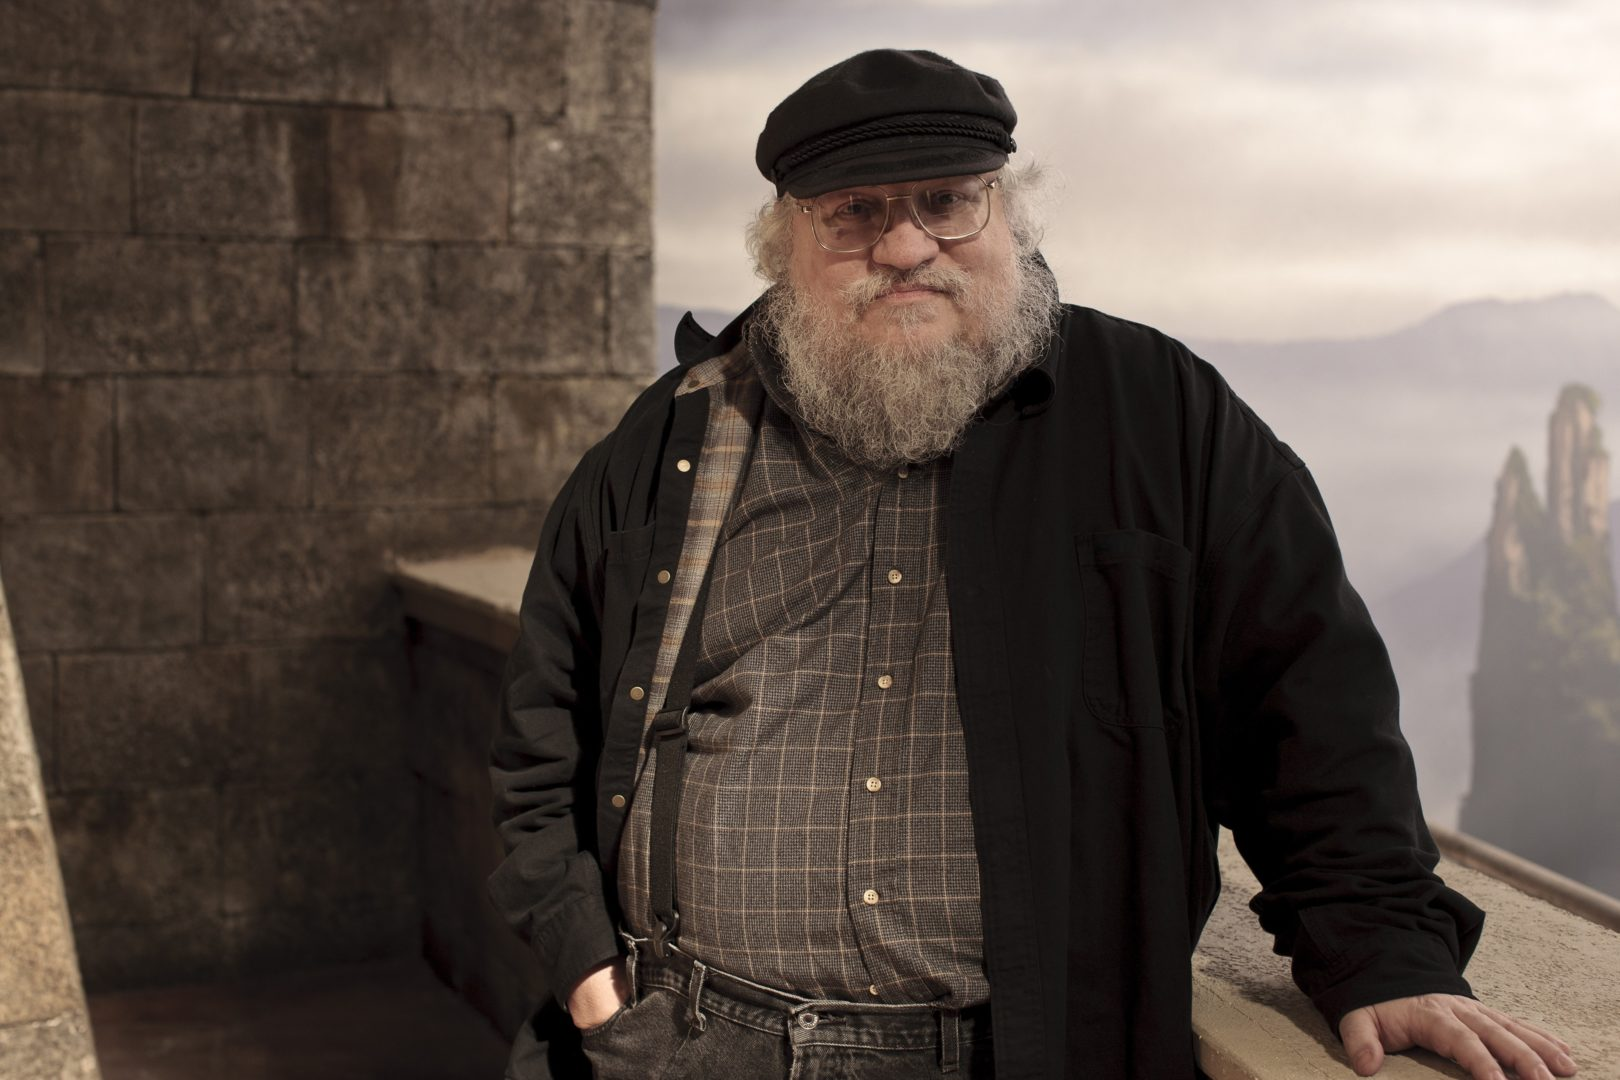 George R.R. Martin Game of Thrones Il Trono di Spade The Winds of Winter